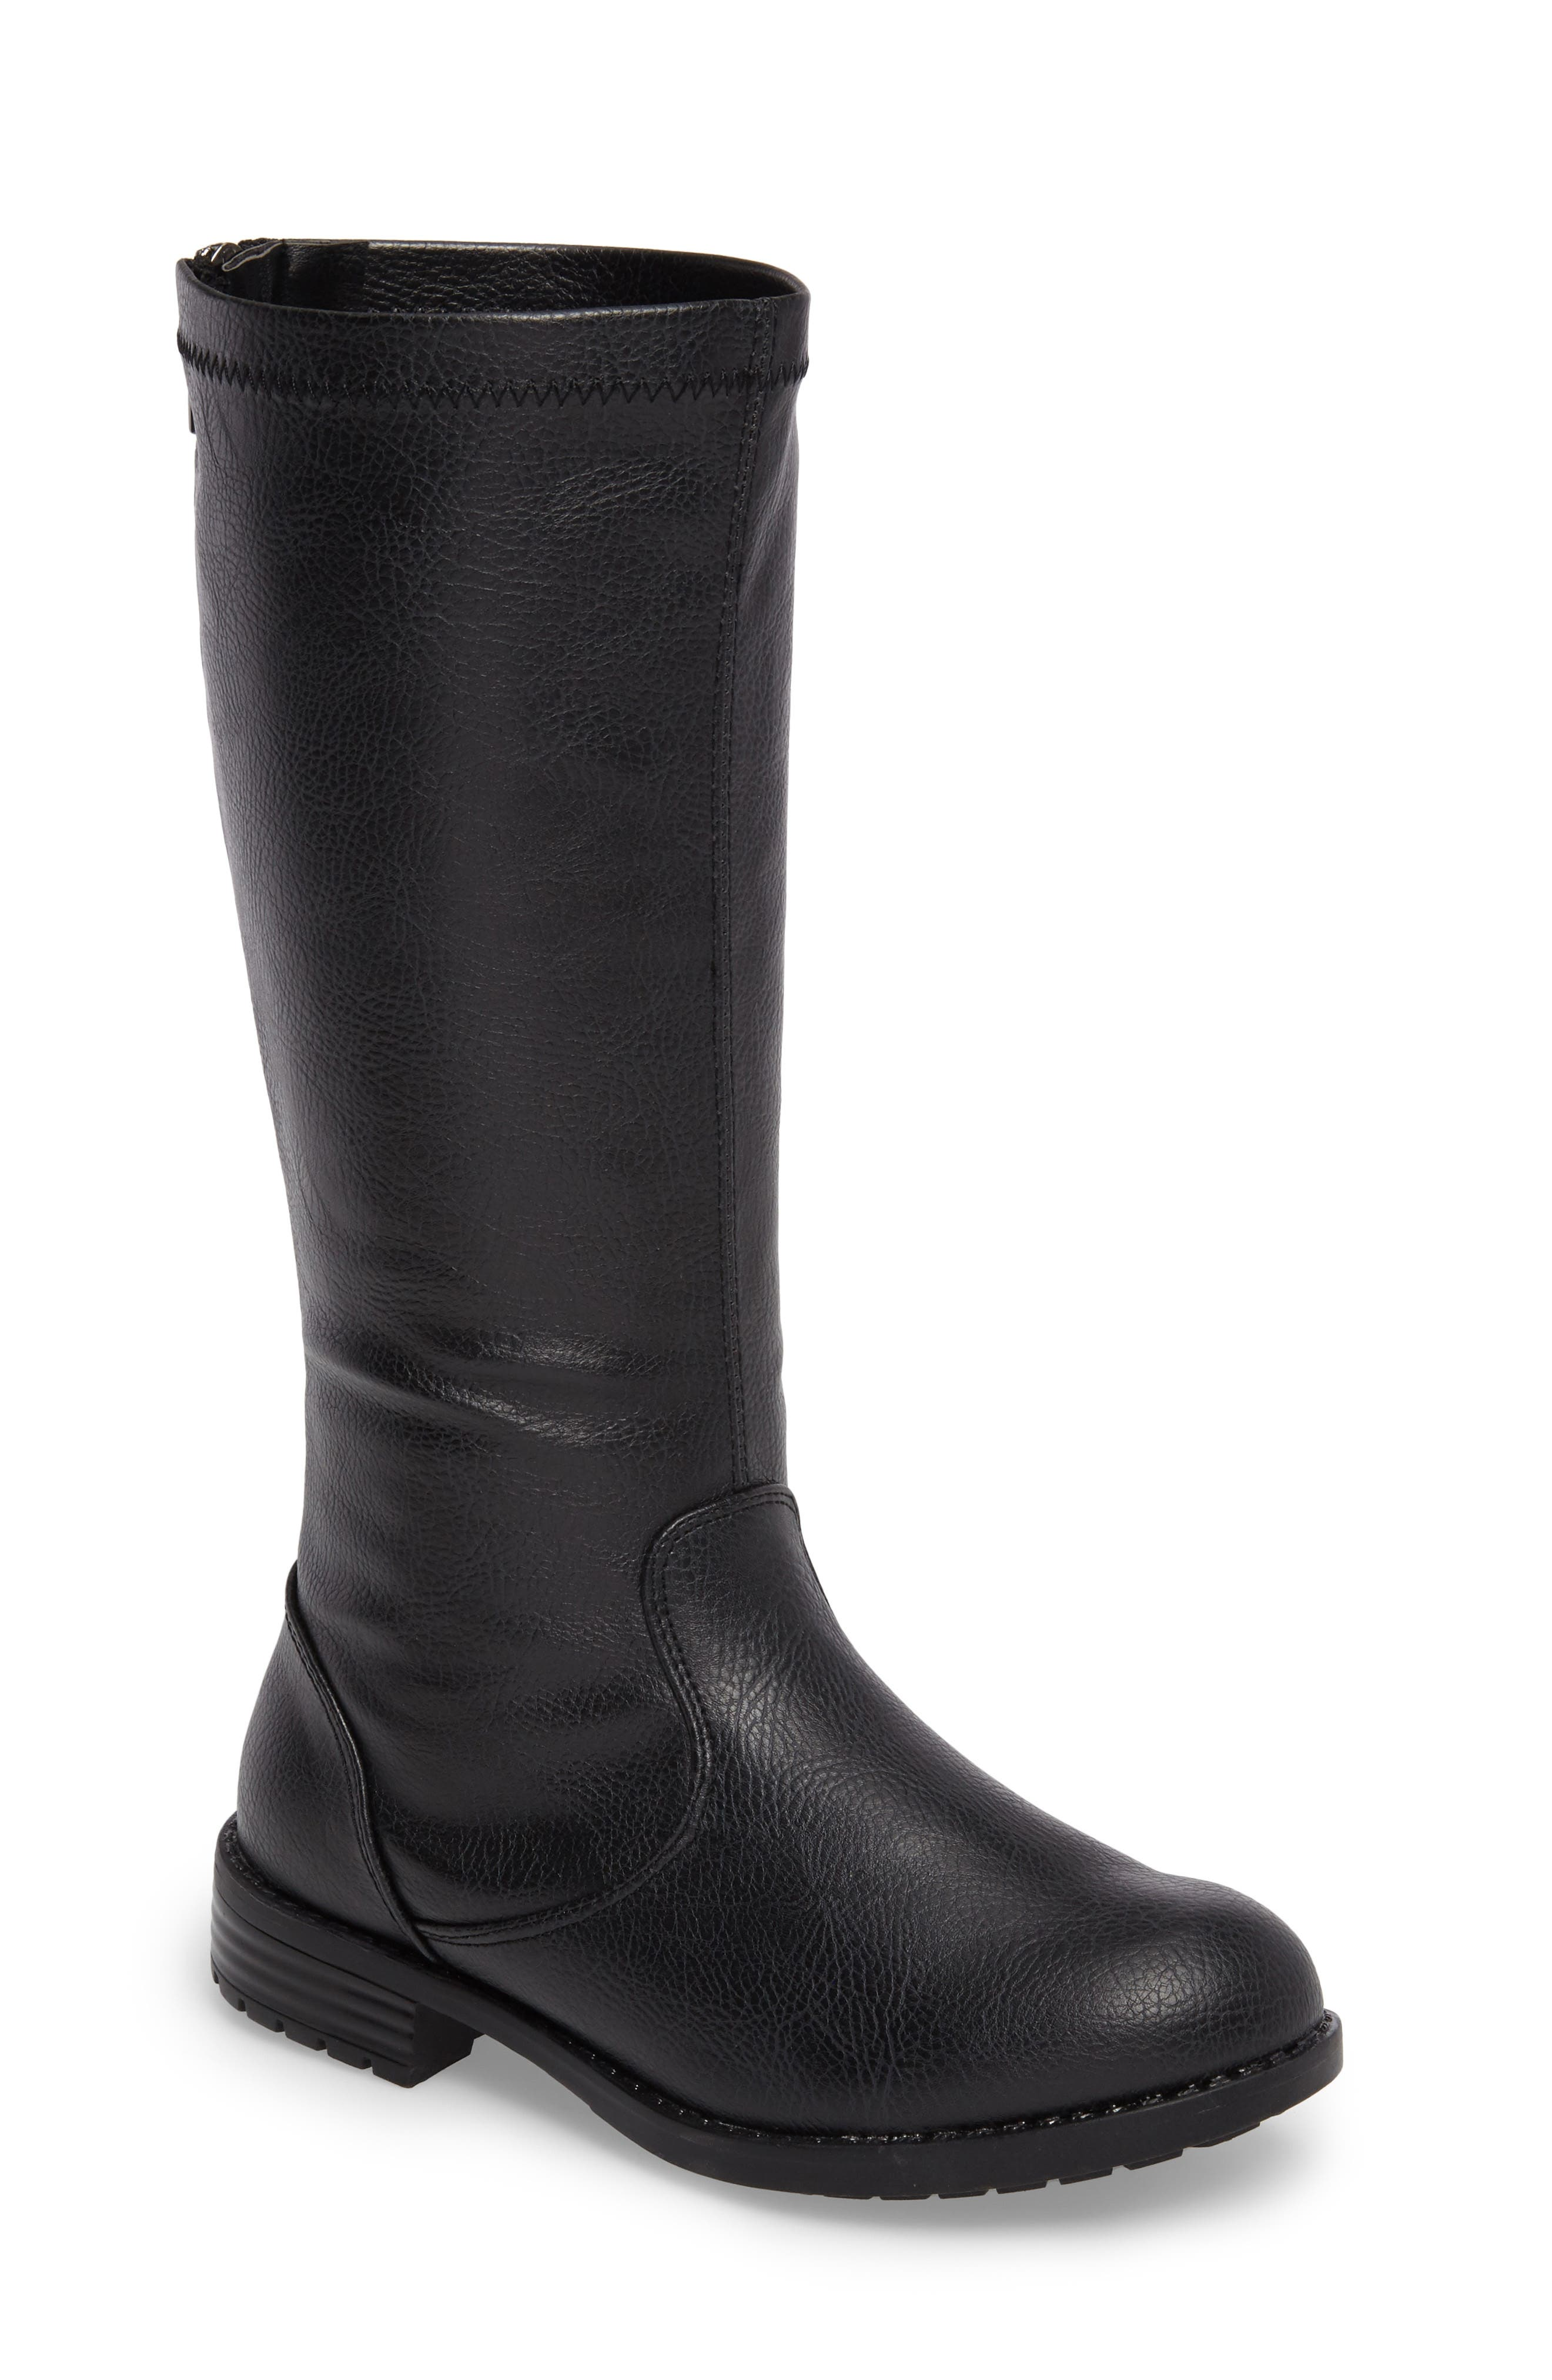 Autumn Stretch Boot,                         Main,                         color, Black Faux Leather